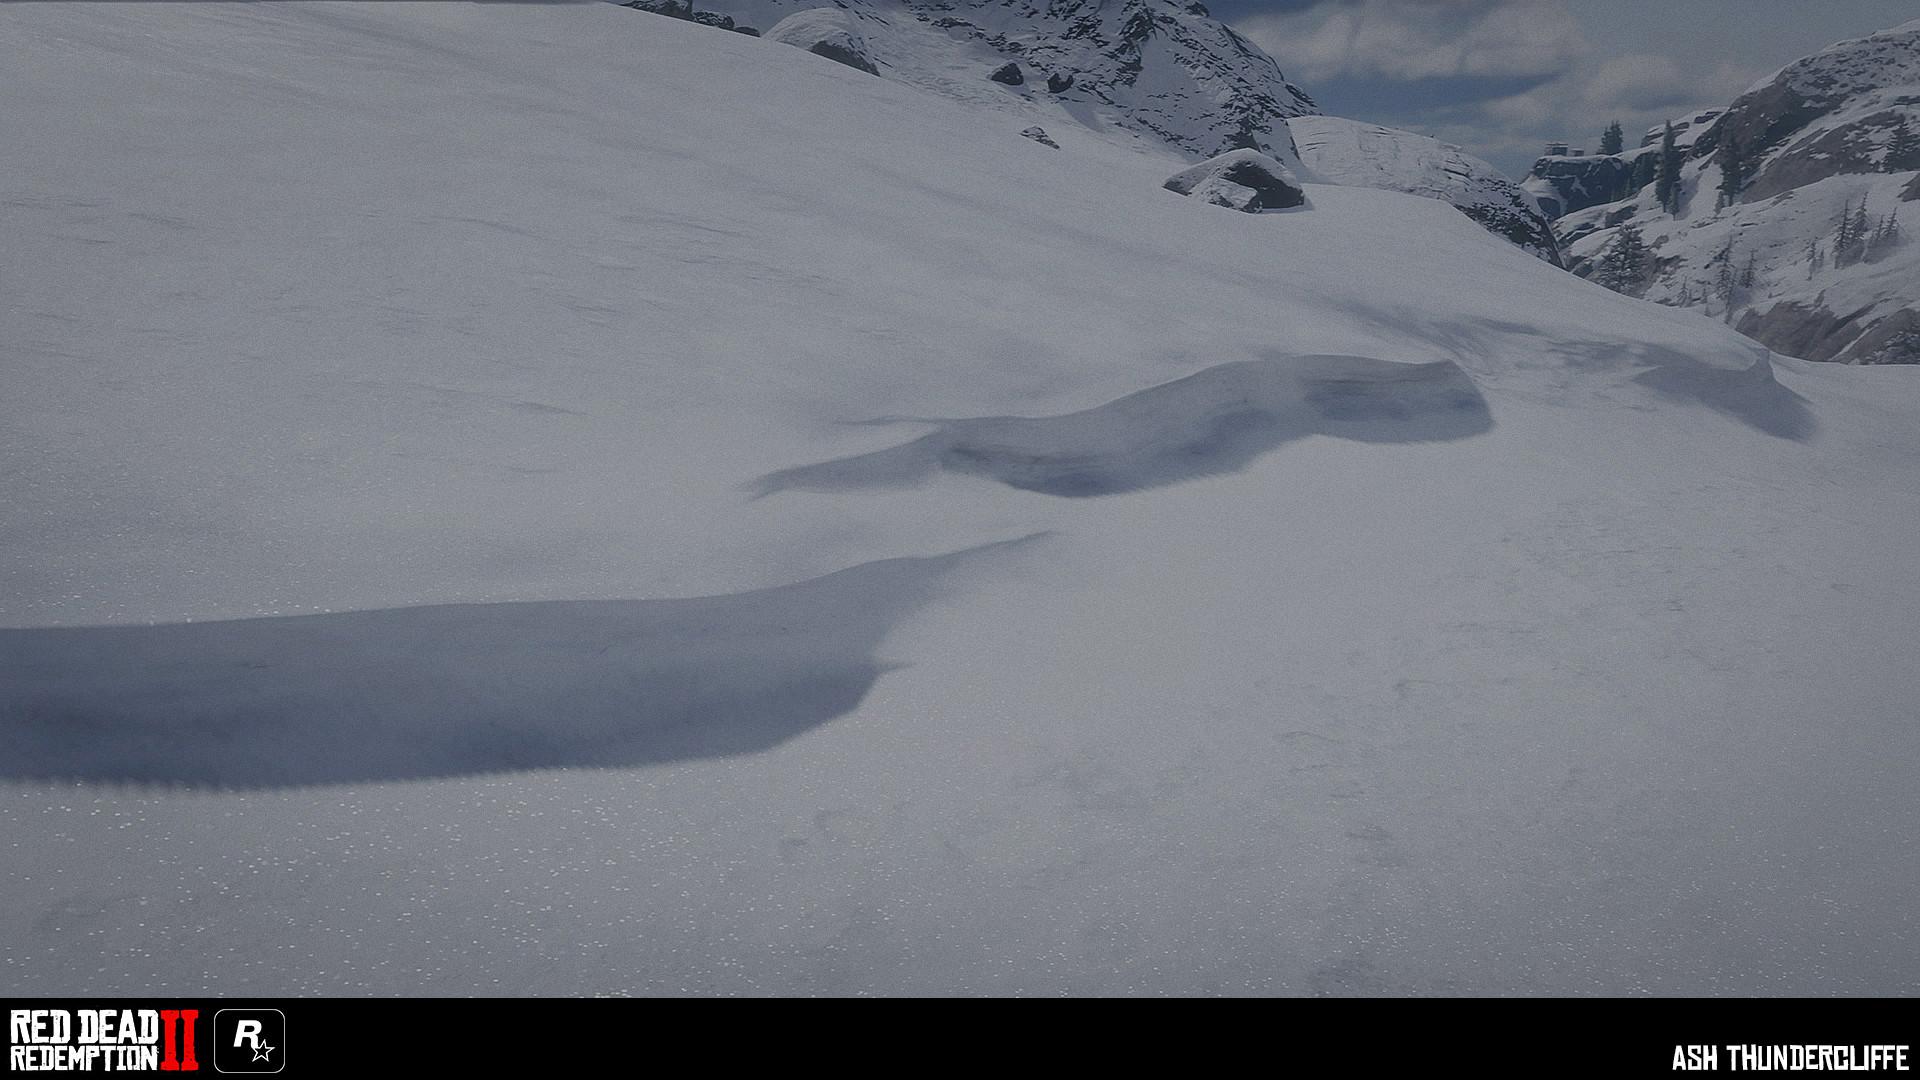 Ash thundercliffe snow 2